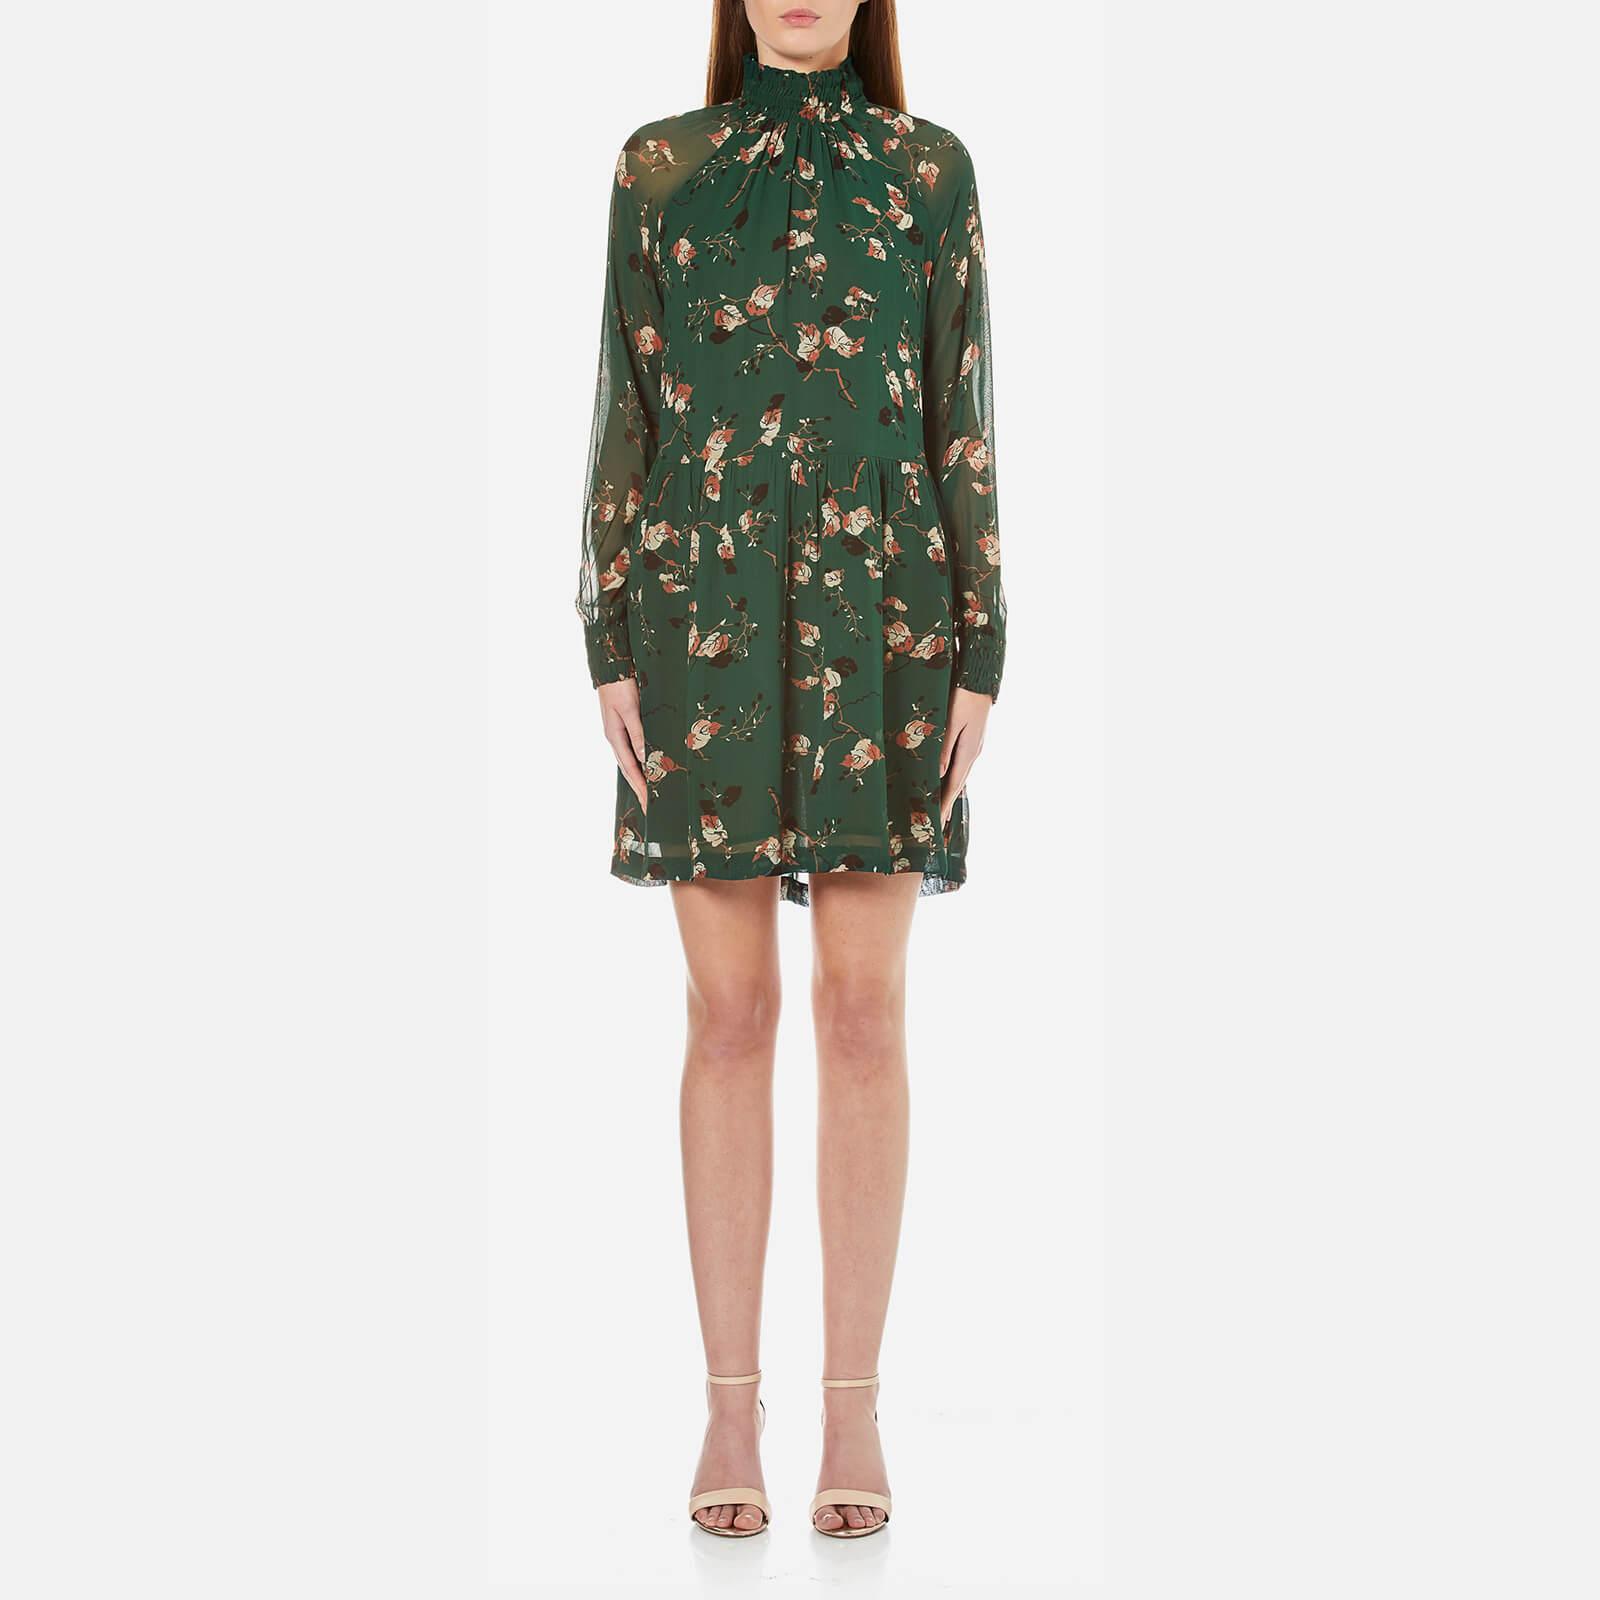 4fef407d Ganni Women's Marietta Georgette Dress - Pine Grove Leaves - Free UK  Delivery over £50